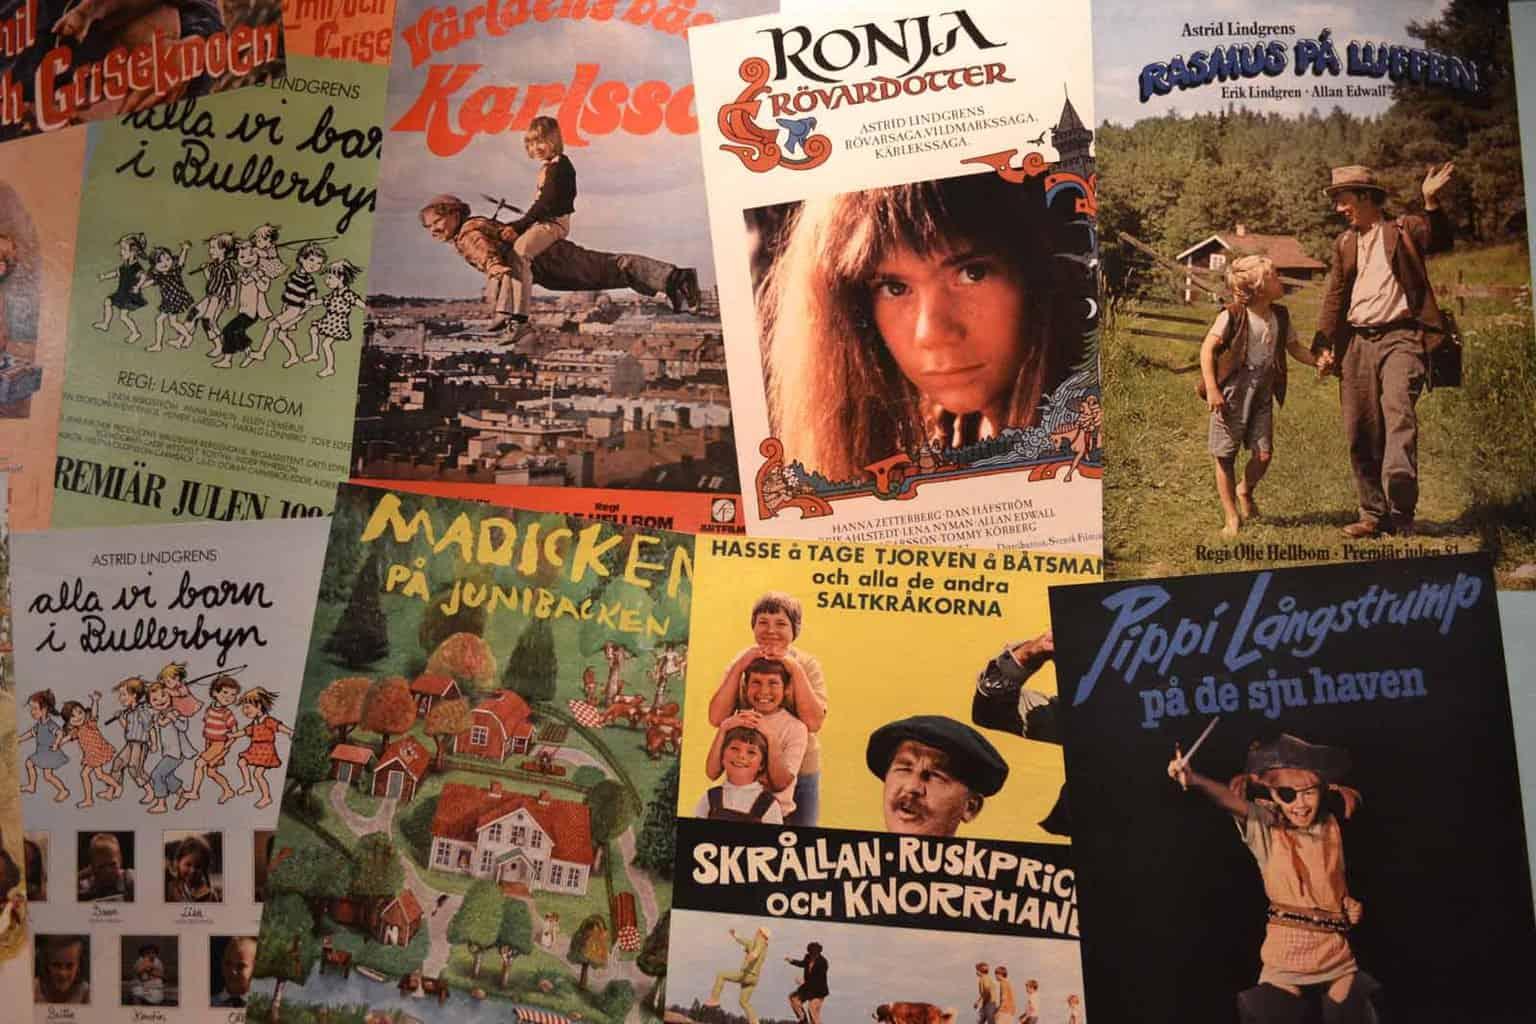 Filmmuseum zweden